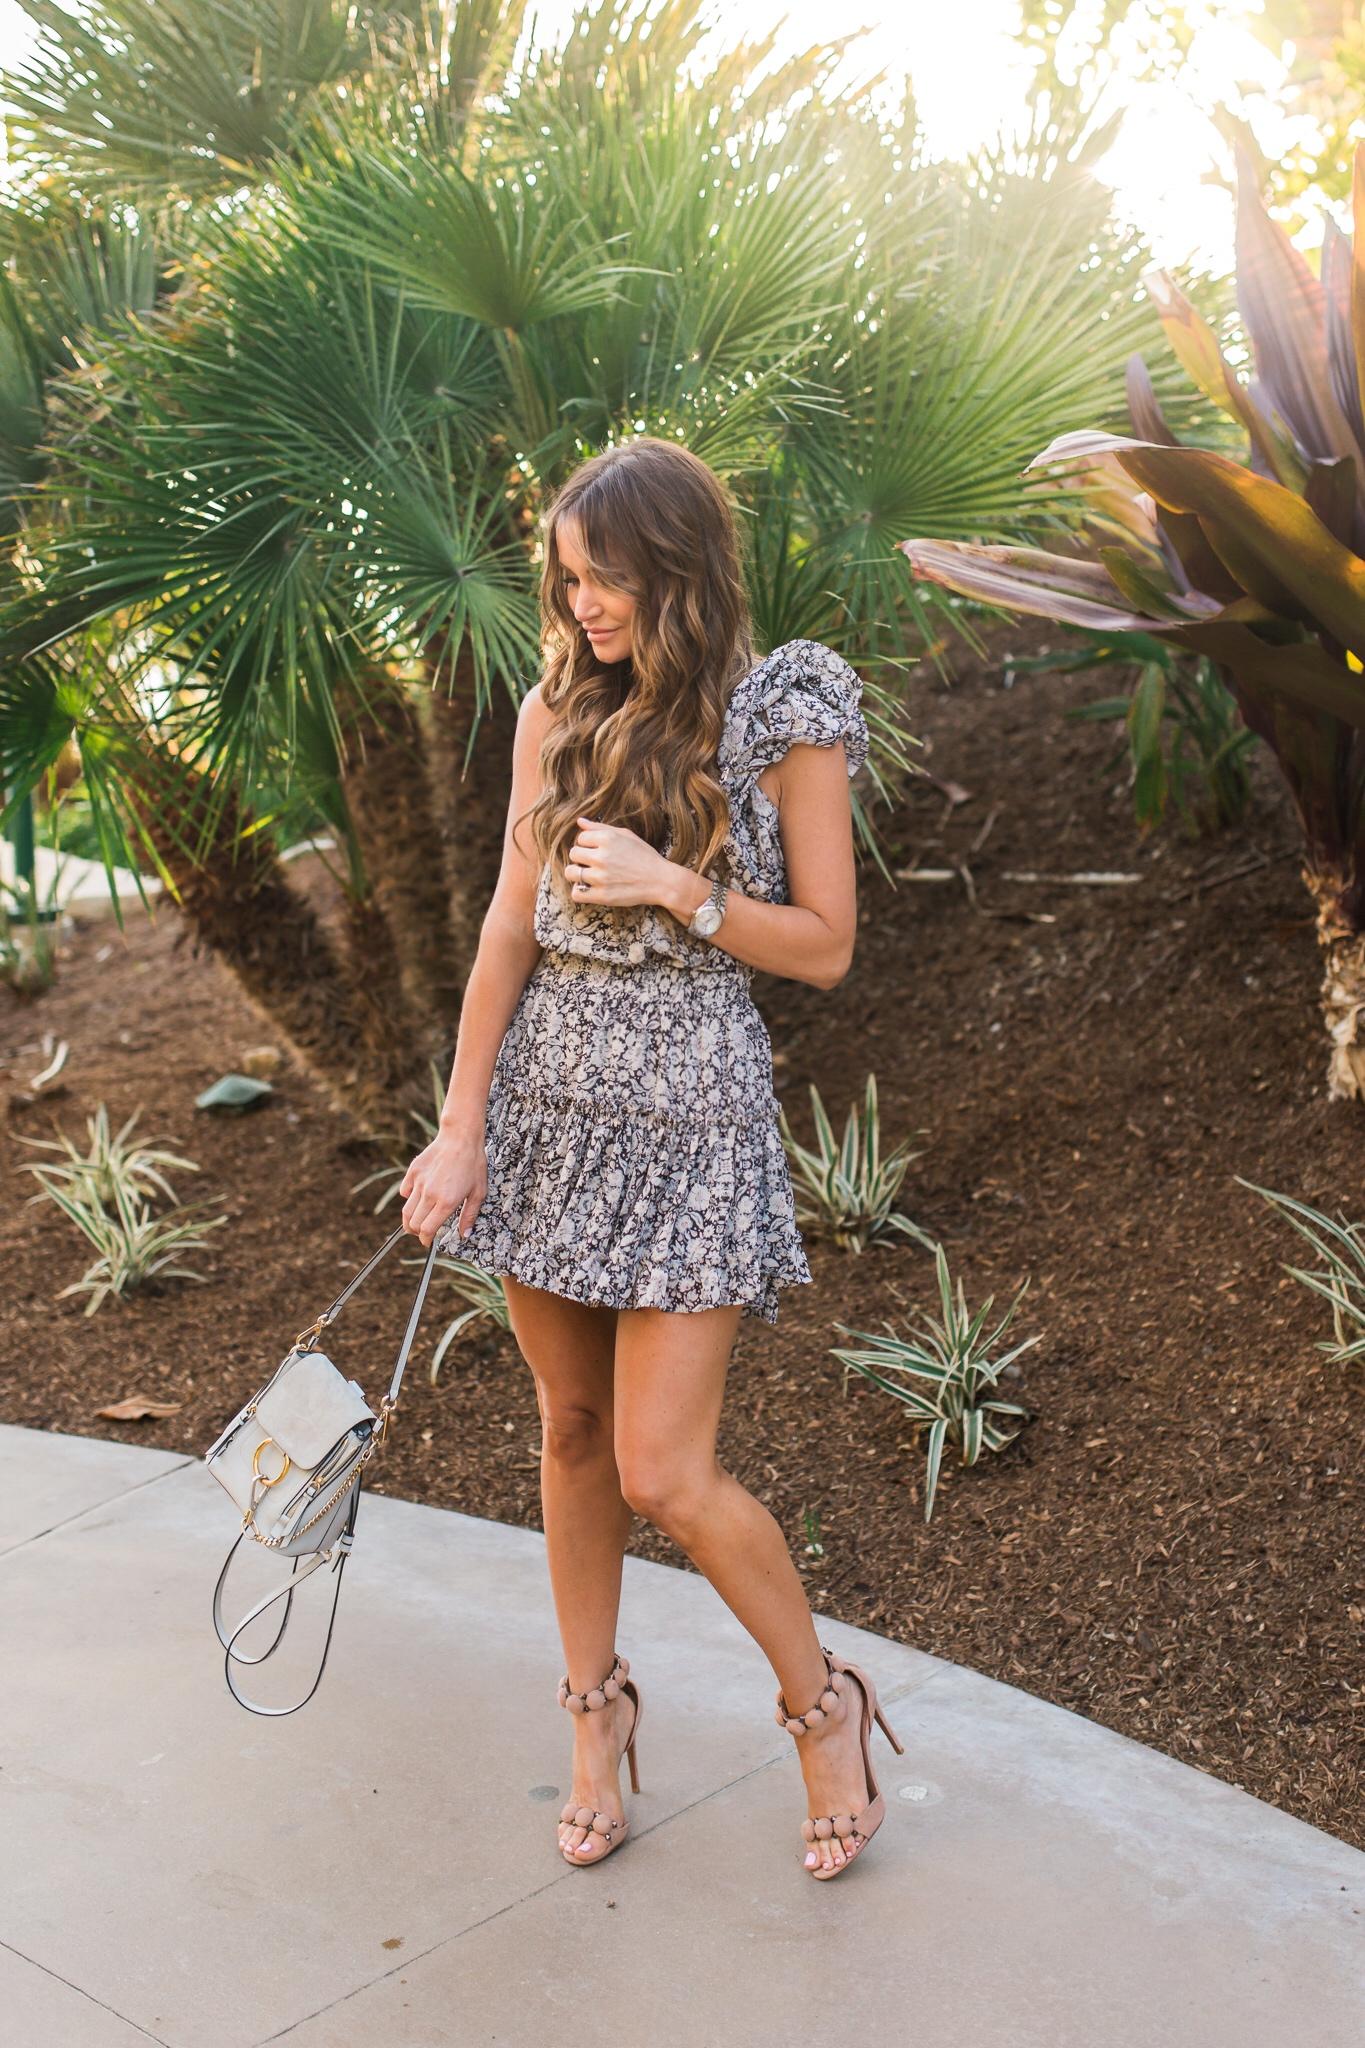 DKW Fashion - Danielle K. White